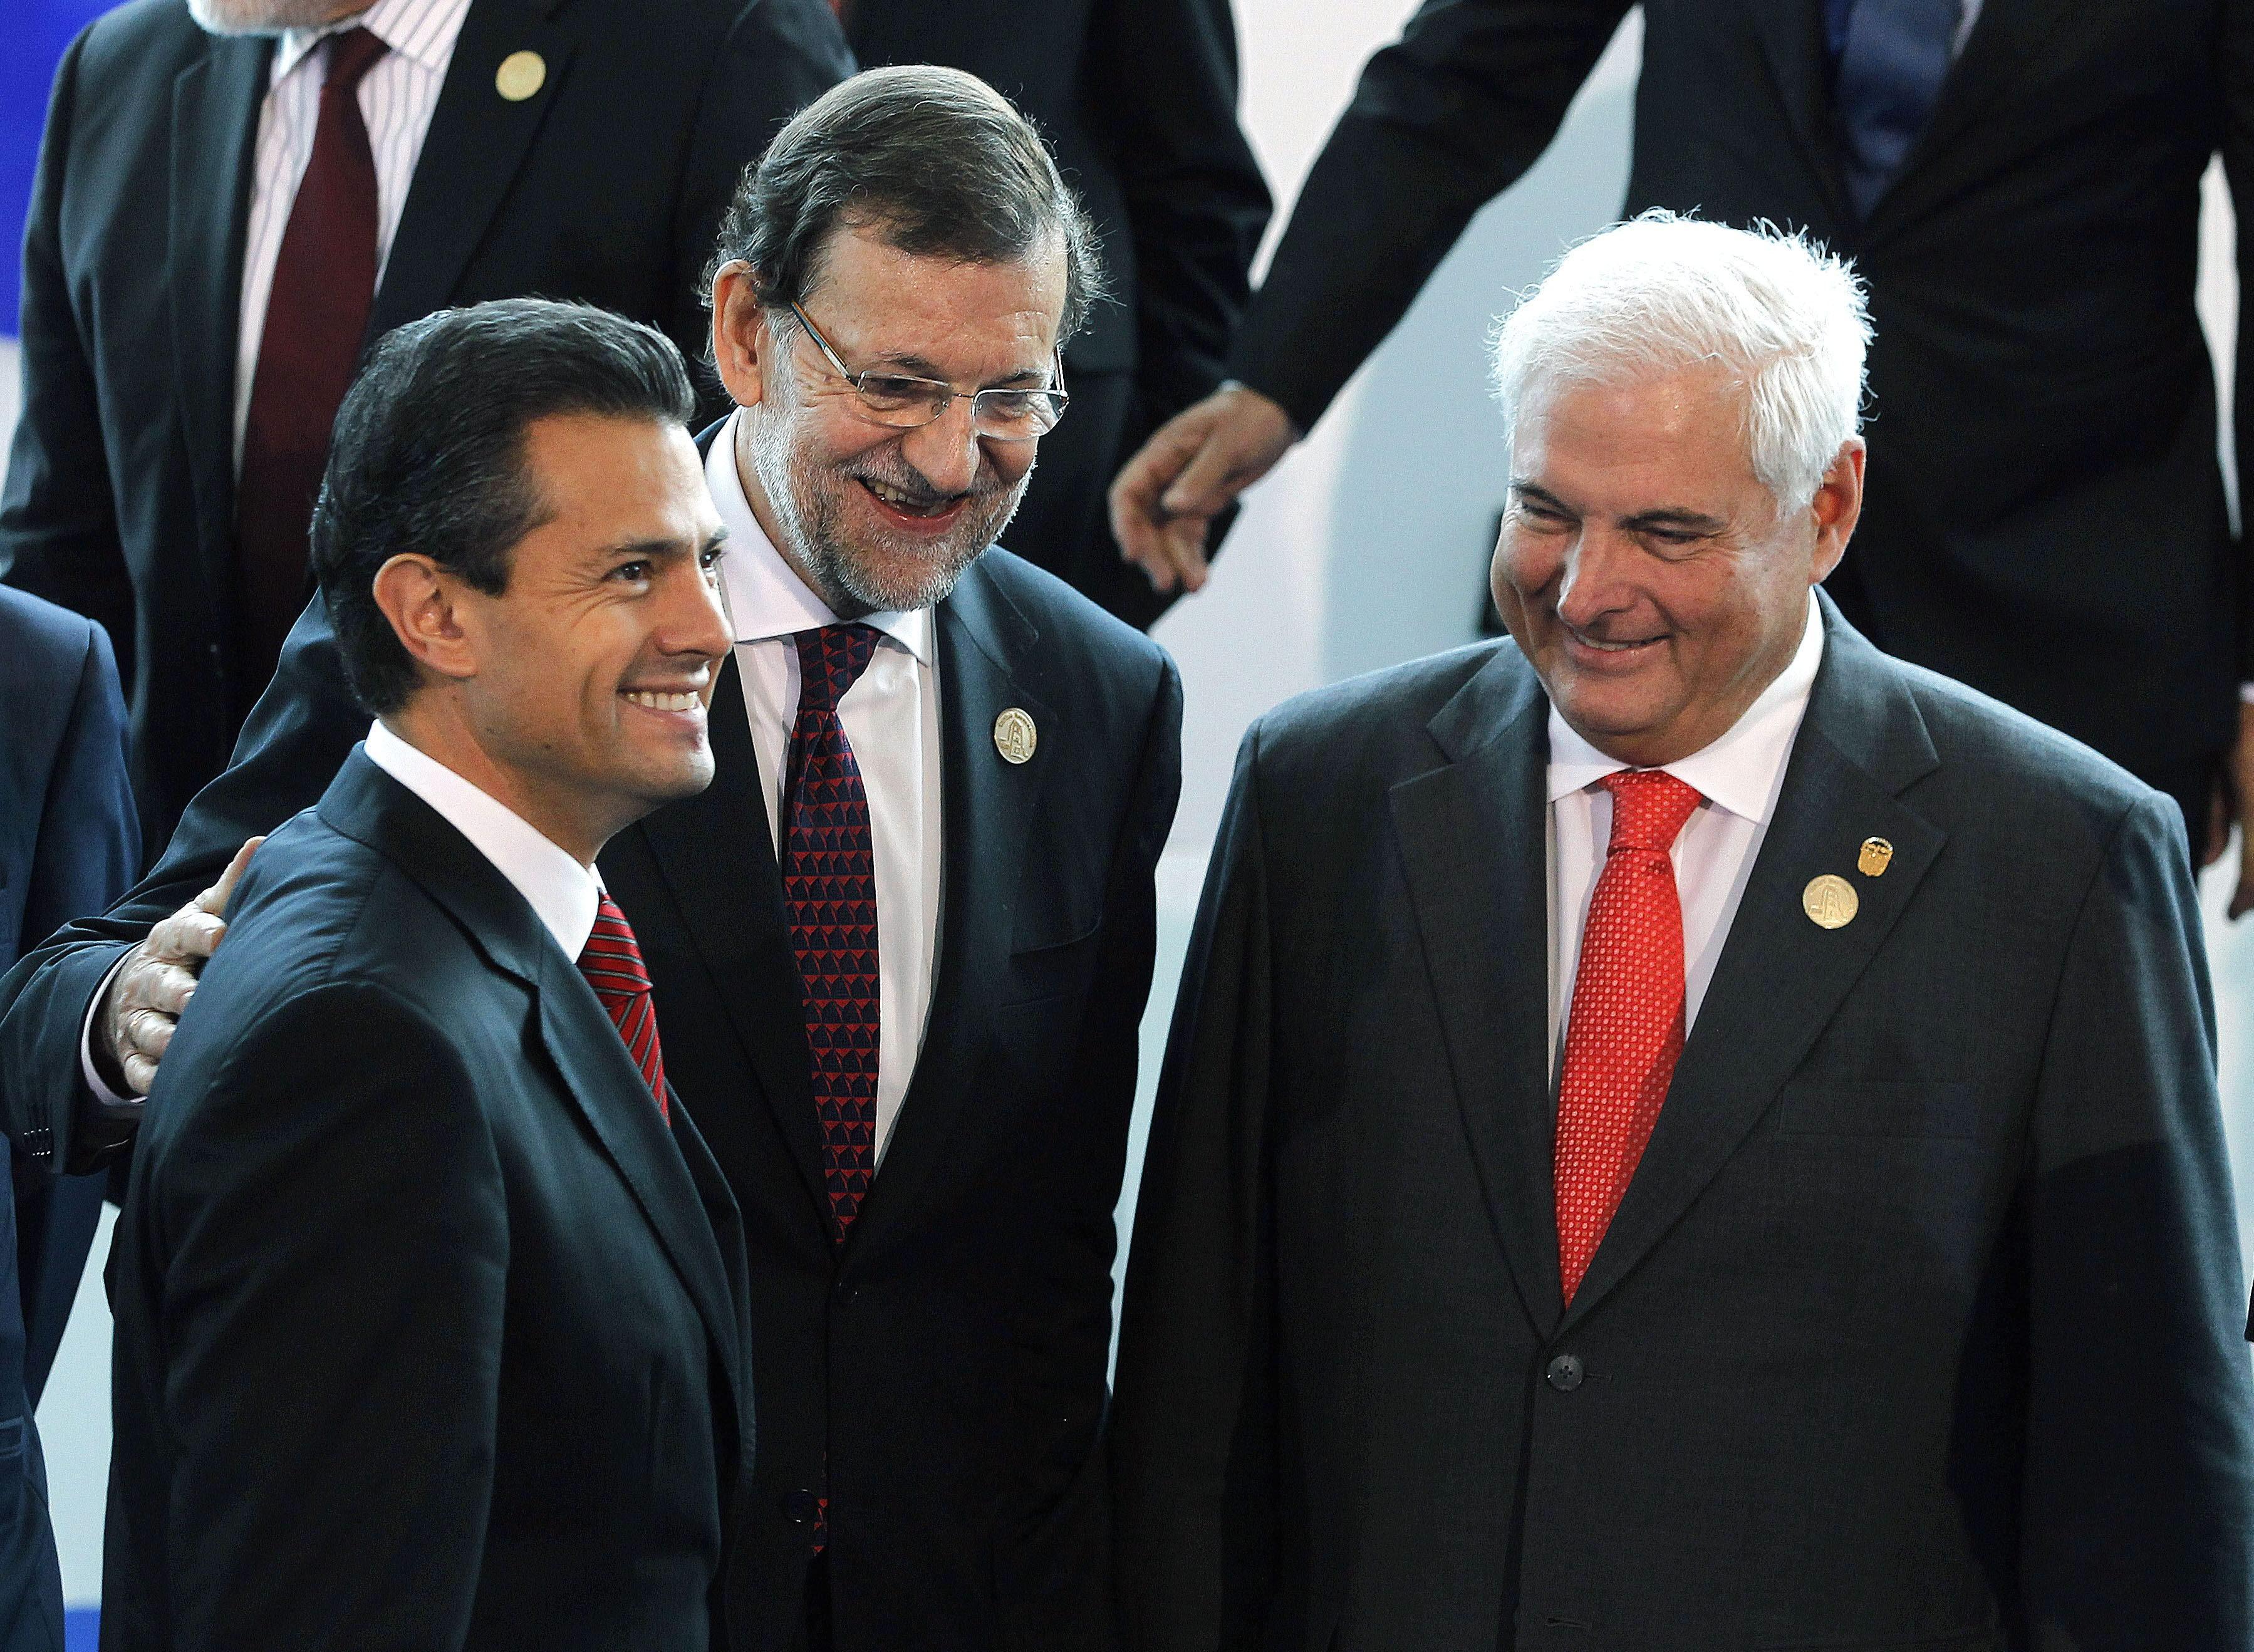 La Cumbre de Panamá vuelve a pedir a EE.UU. el fin del bloqueo económico a Cuba